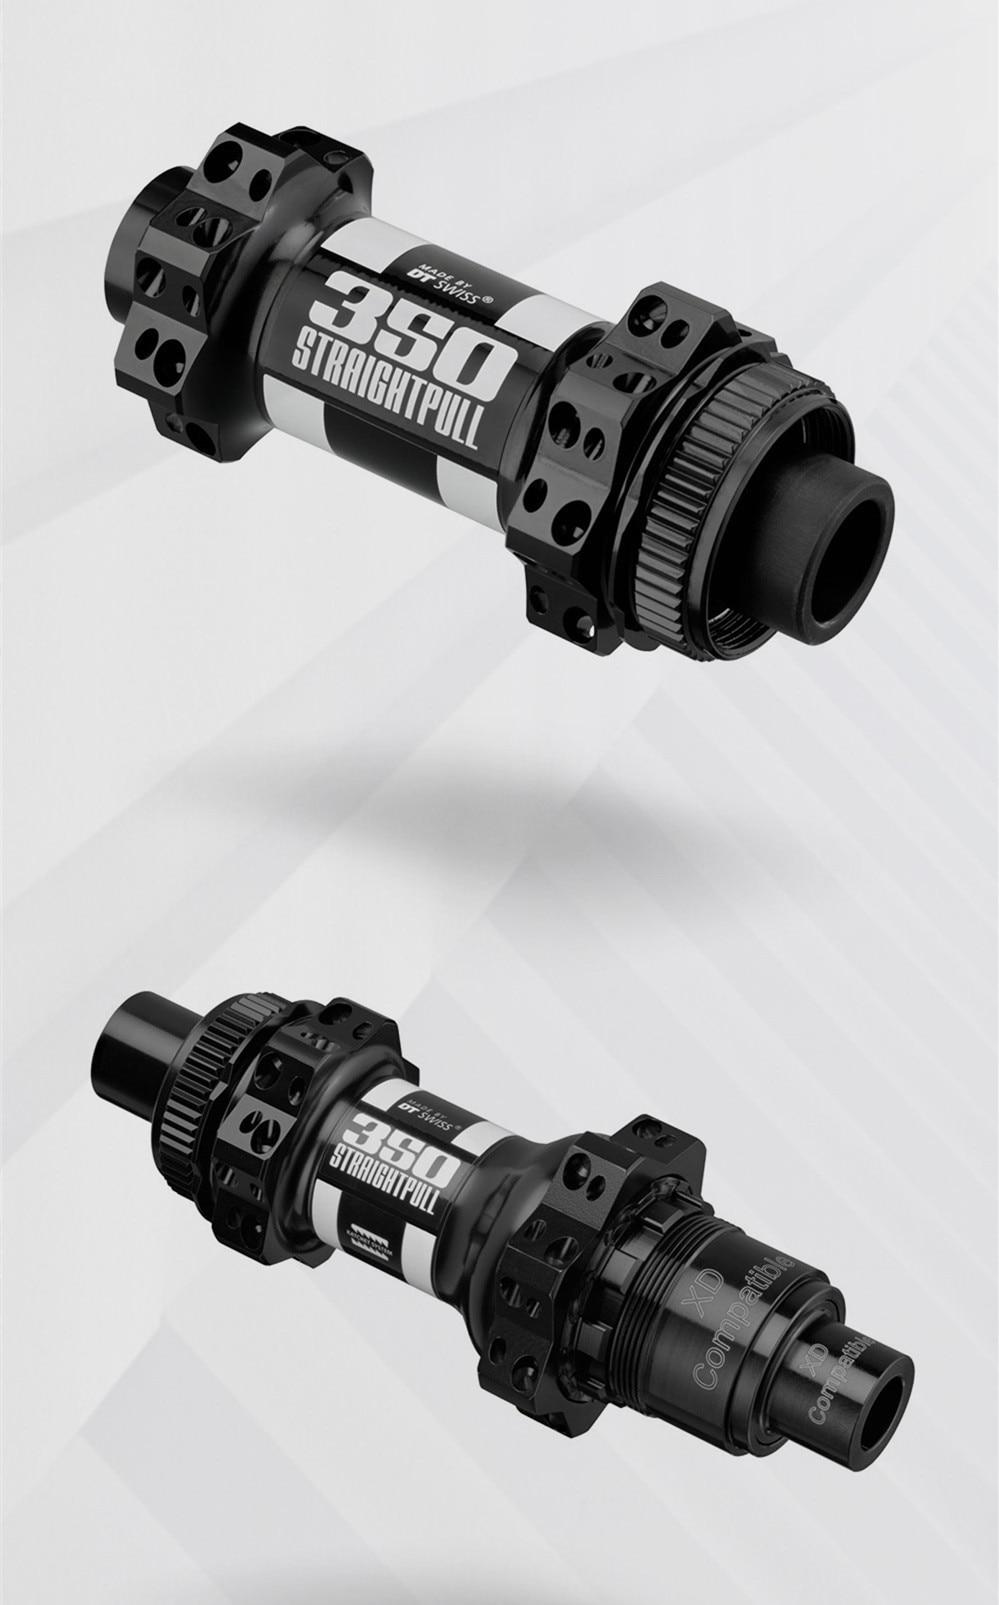 HTB1XloUbXuWBuNjSszbq6AS7FXap - ELITE DT Swiss 350  All Mountain Wheelset 30mm*30mm Rim Tubeless 27.5 MTB Wheel Japan Toray T700 Carbon Fiber 1515g Only